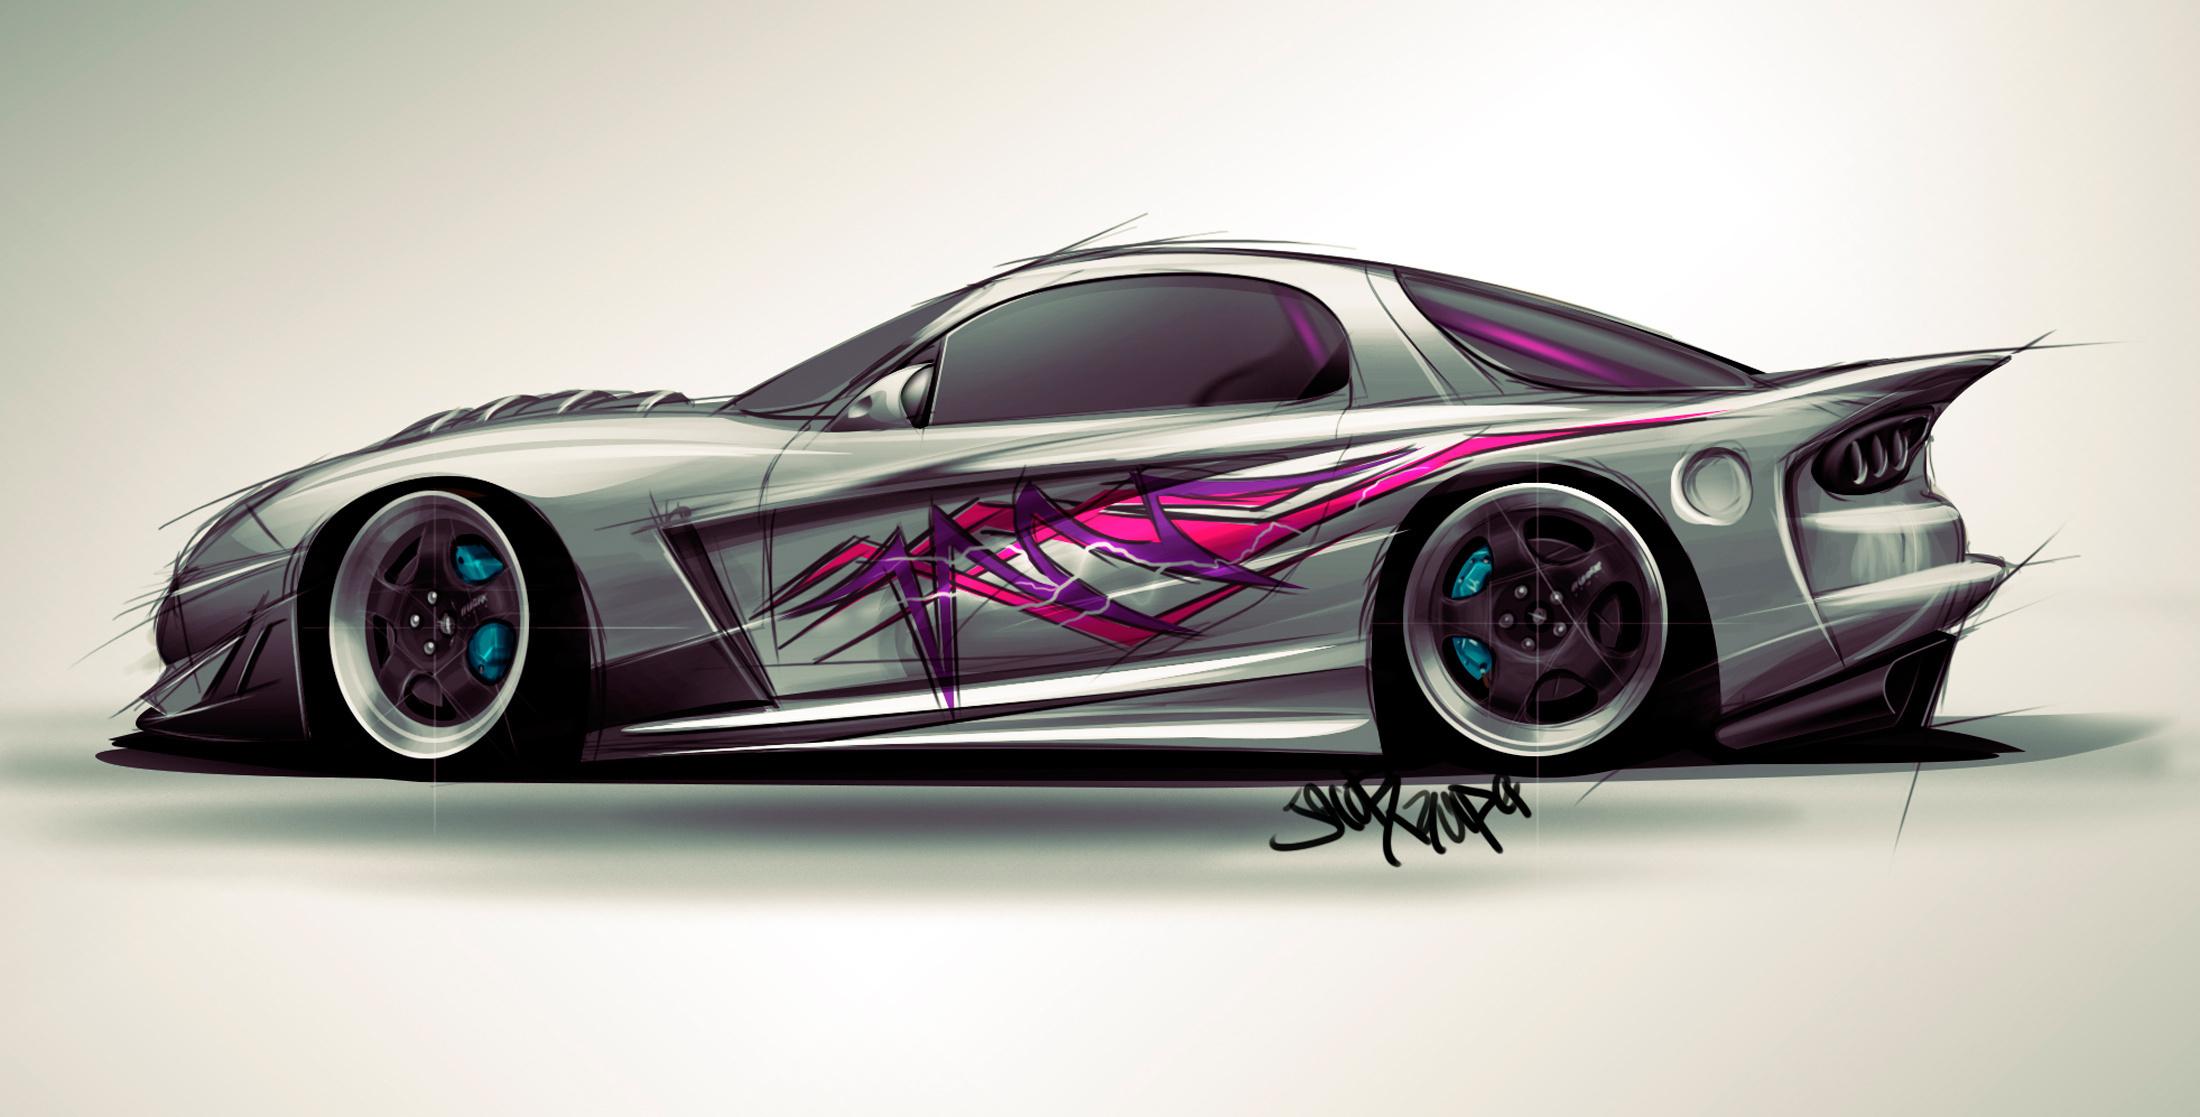 Wallpaper Cars Car Drawing